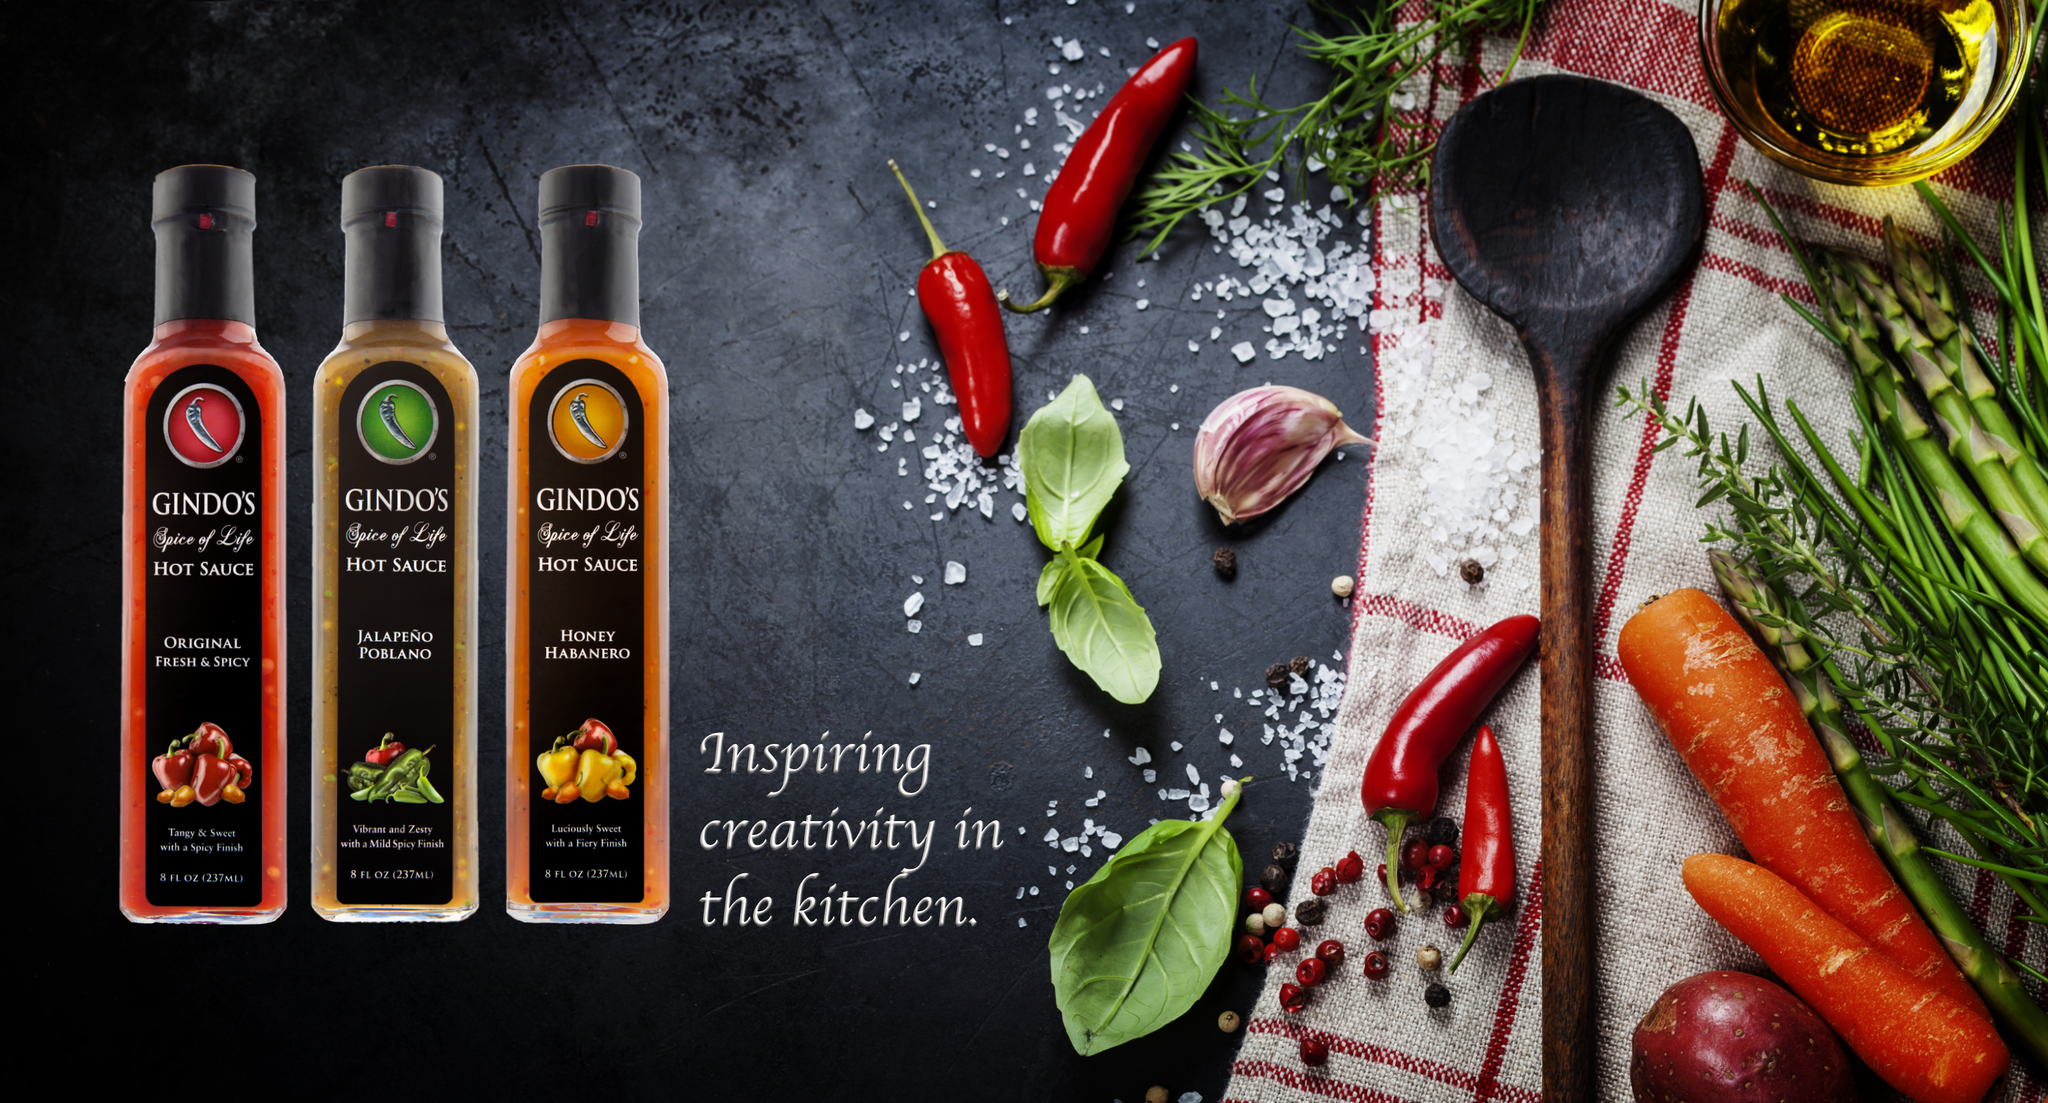 Gindo's Hot Sauce Case Study Image